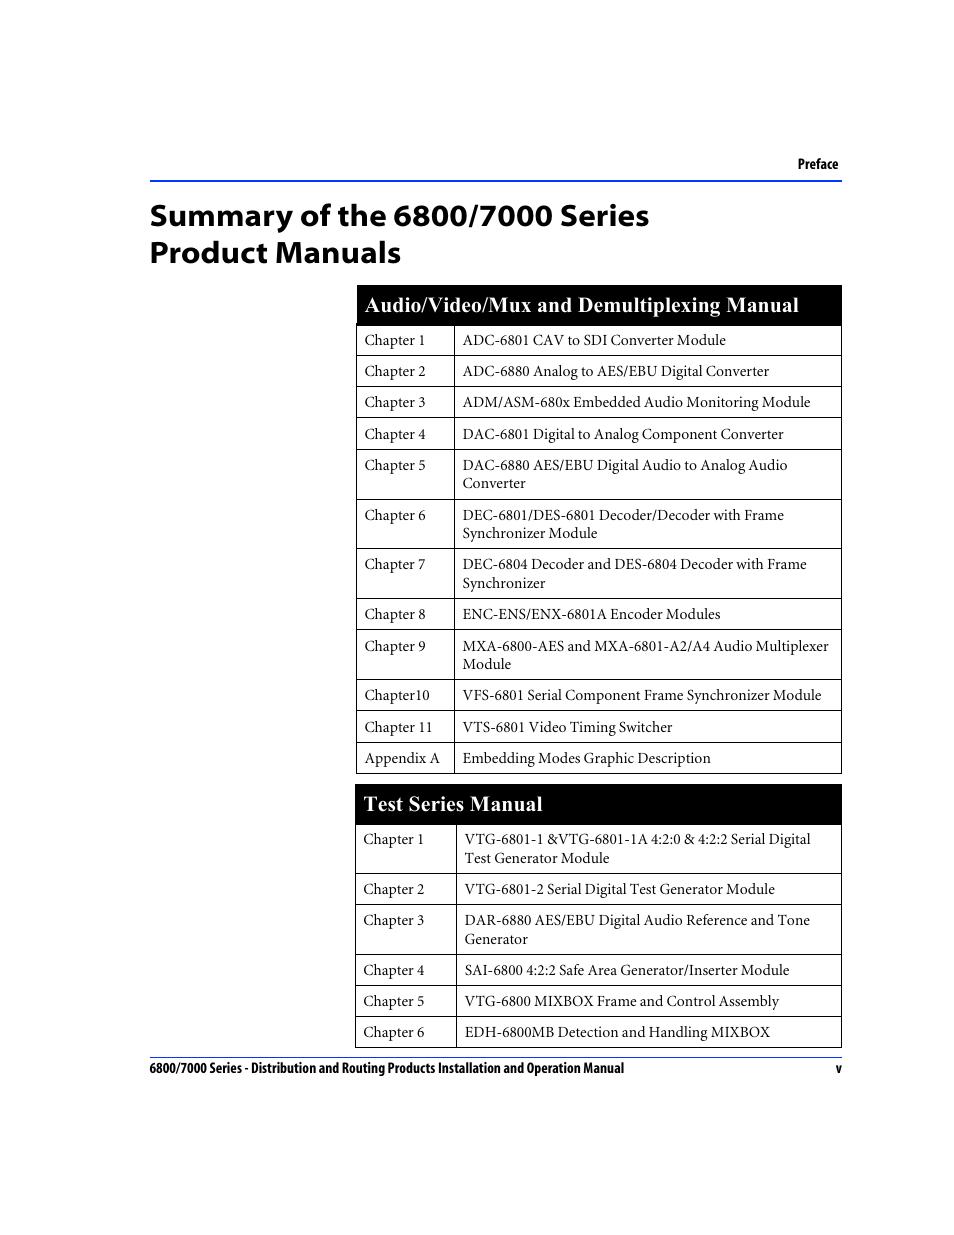 audio video mux and demultiplexing manual test series manual rh manualsdir com Nokia E61 Nokia 8600